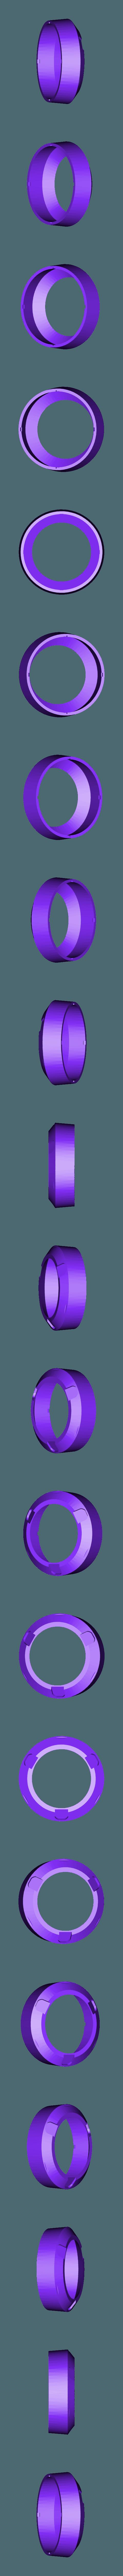 Part3-1.STL Download STL file Tracer pulse bomb. • 3D printable design, Cosple